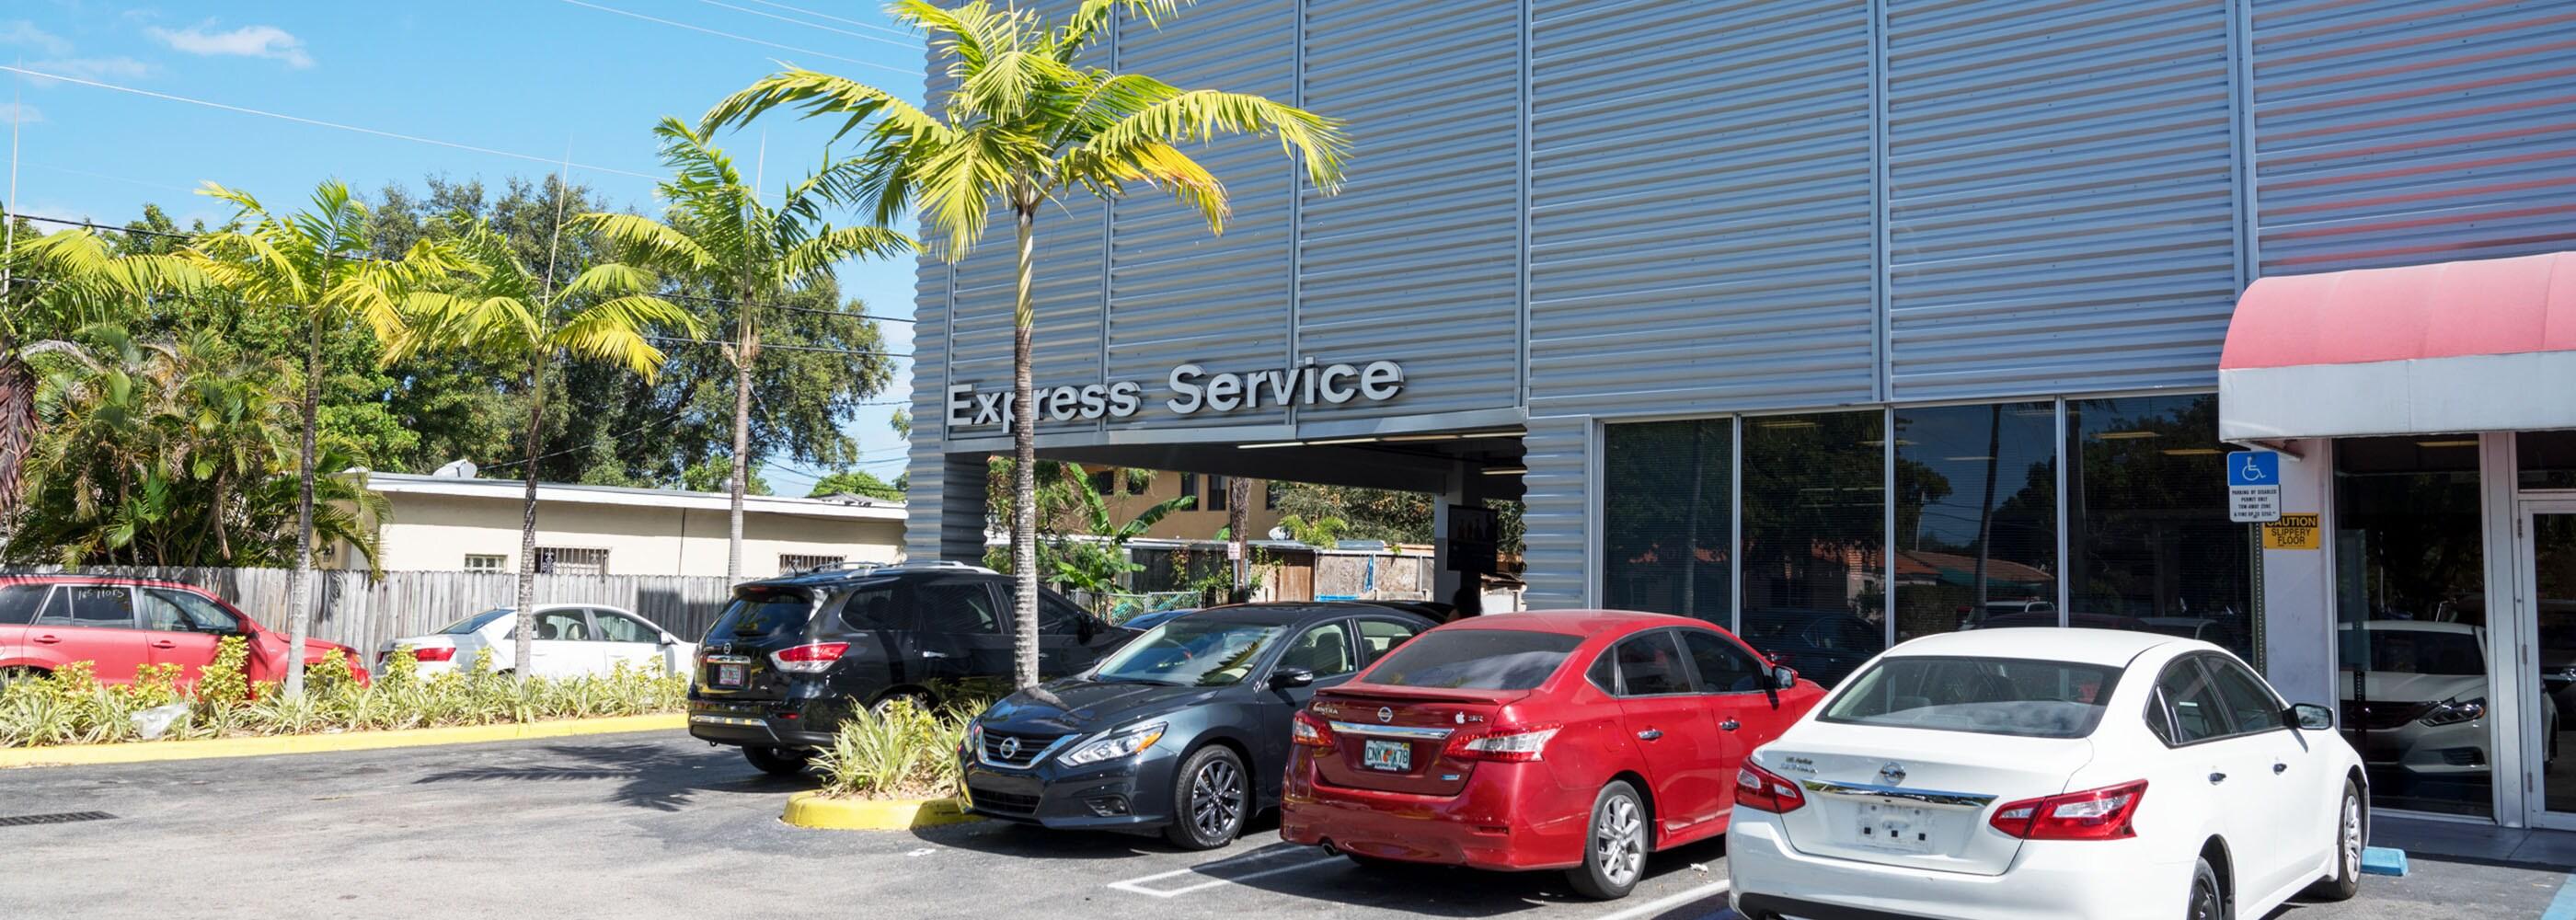 Autonation Nissan Miami >> AutoNation Nissan Miami | Nissan Service Center | Oil